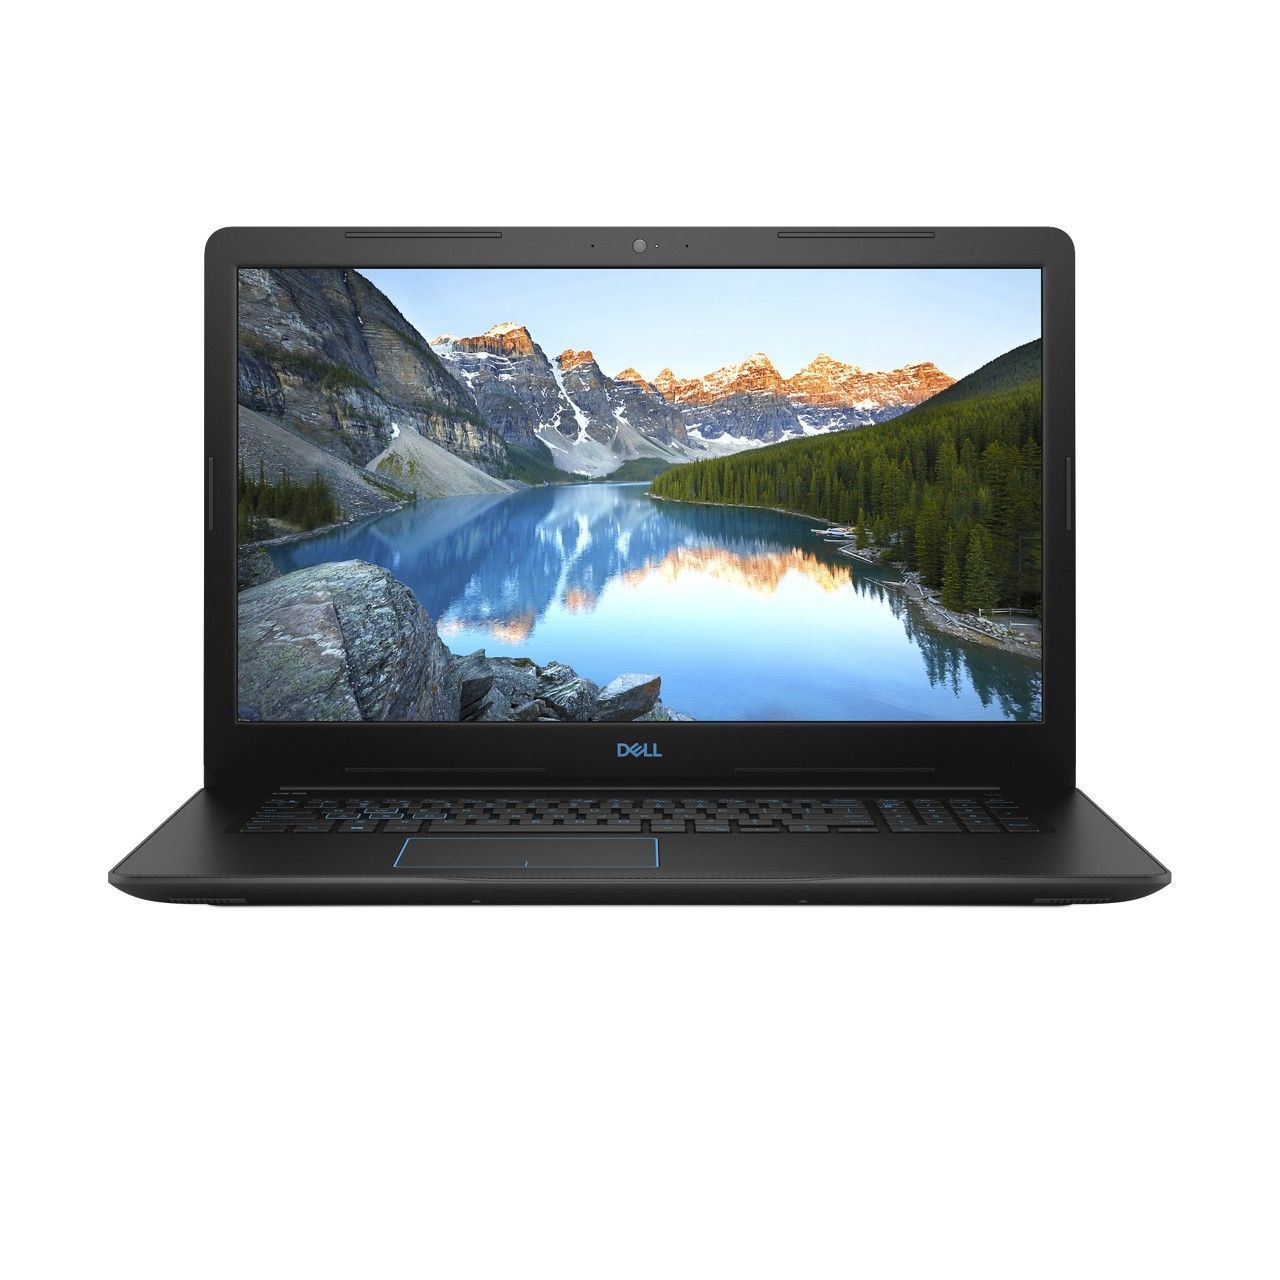 "Dell G3 Gaming Laptop i7-9750H/16 GB/1 TB HDD + 256 GB SSD/NVIDIA GeForce GTX 1650 4 GB/15.6"" FHD/60Hz Refresh Rate/Windows 10/Black"